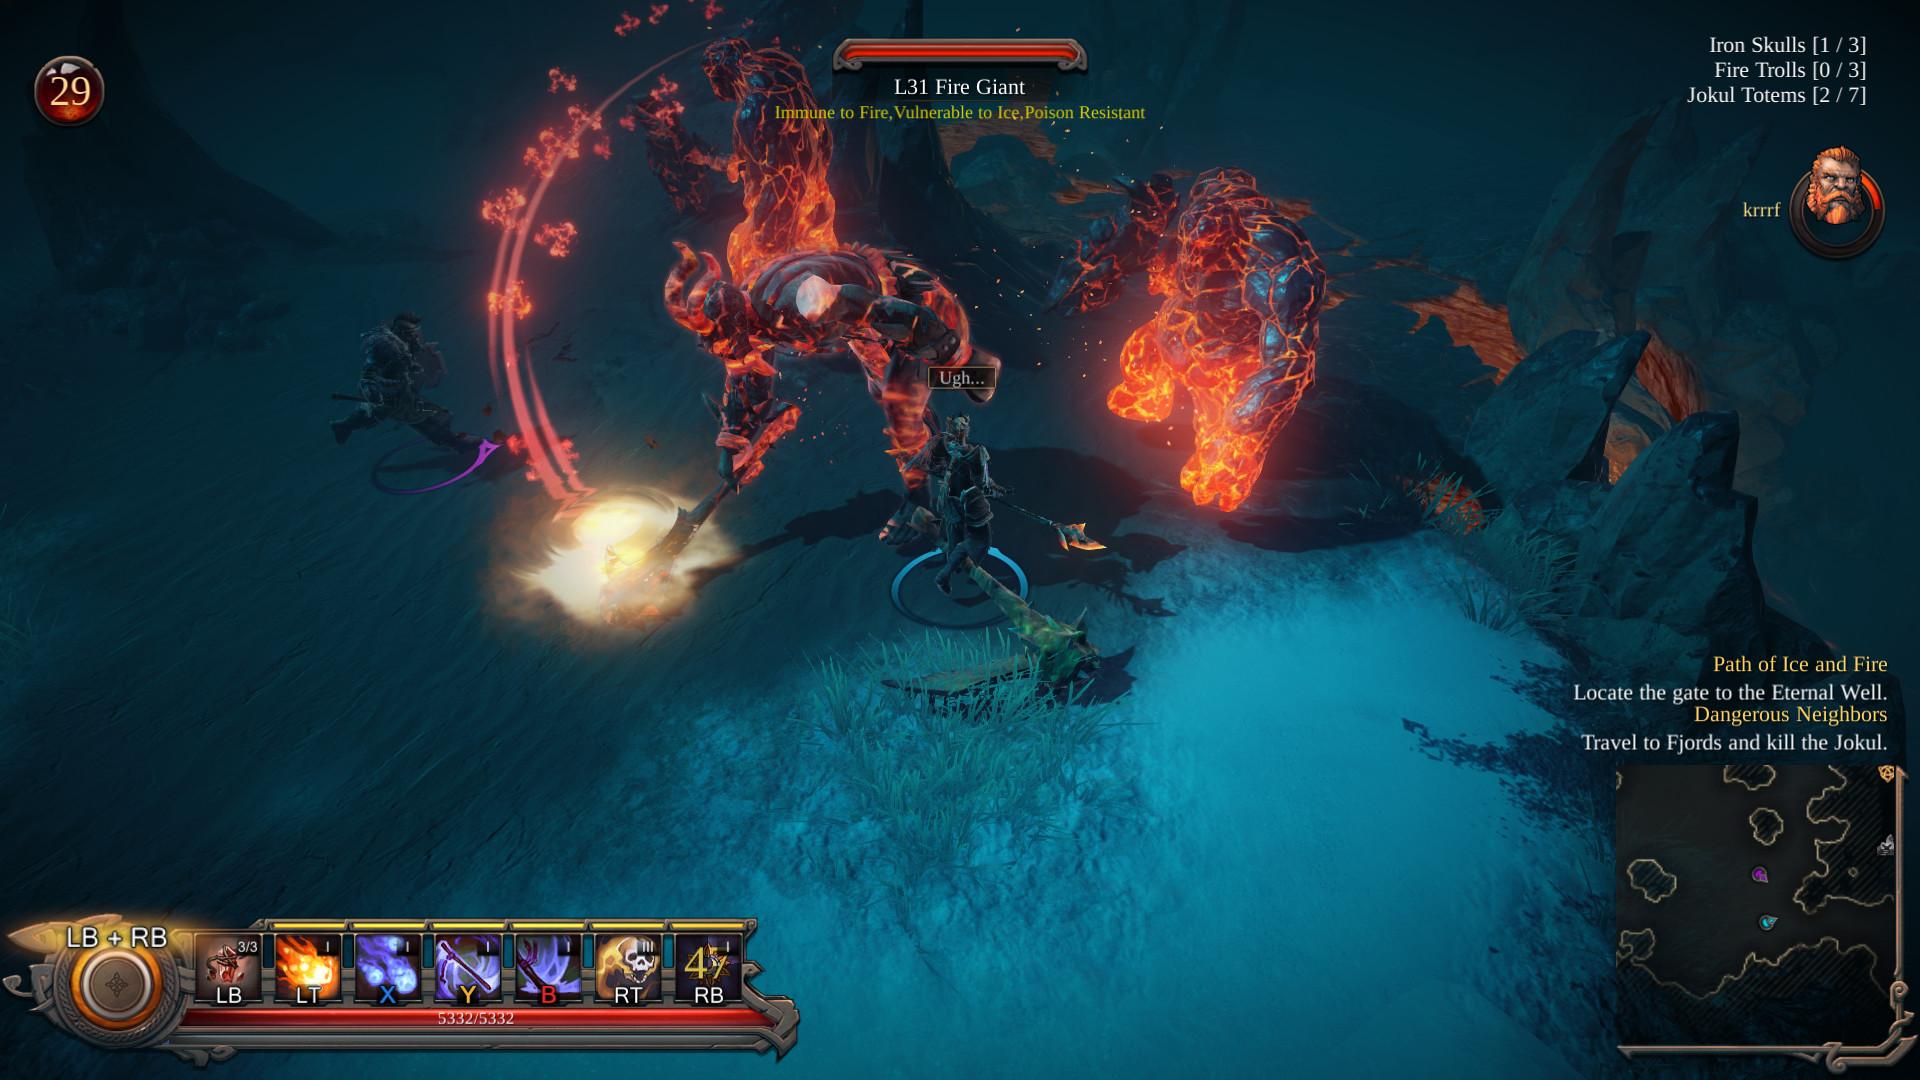 Vikings - Wolves of Midgard Screenshot 3